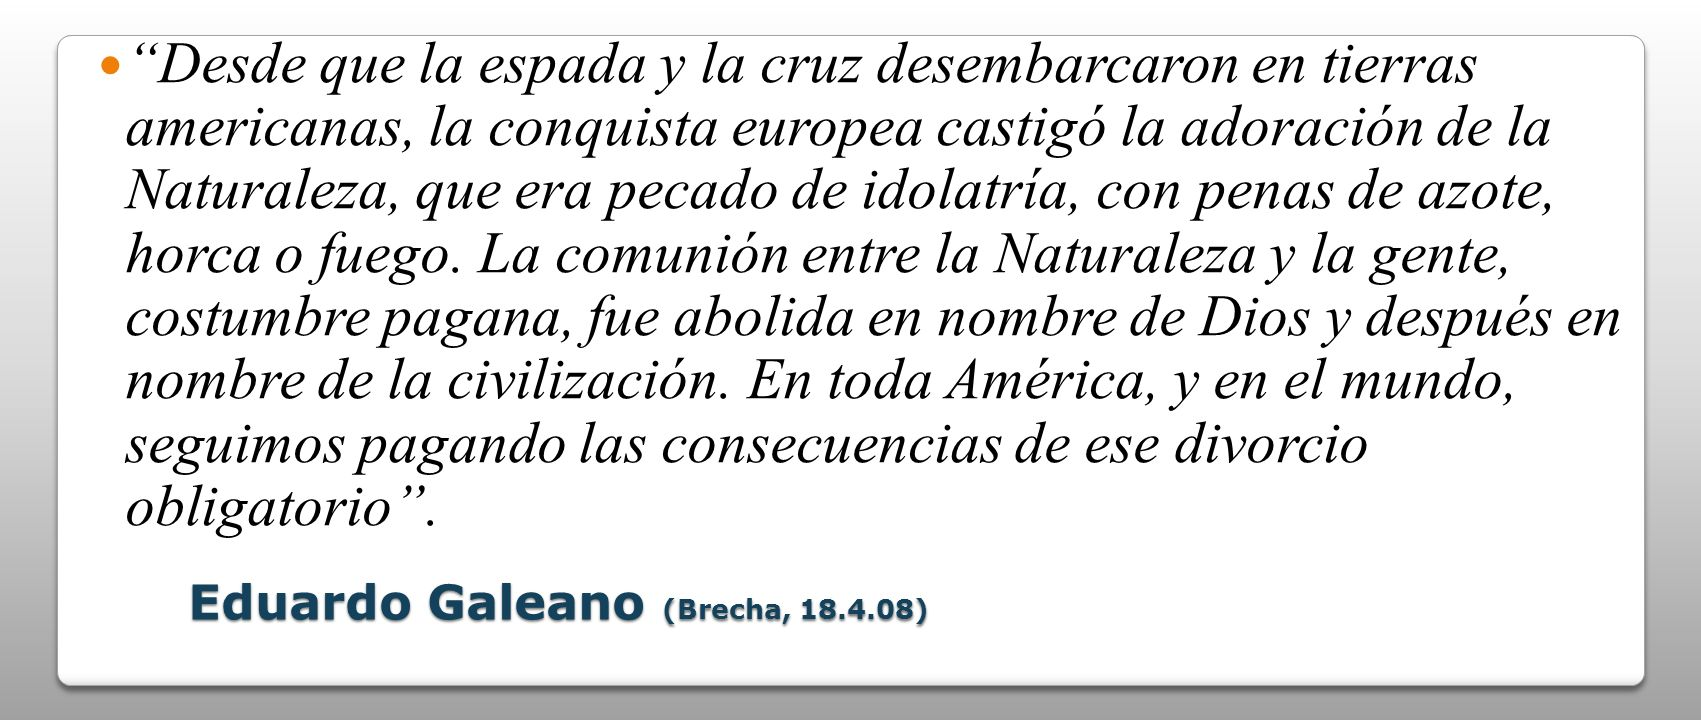 Eduardo Galeano (Brecha, 18.4.08)